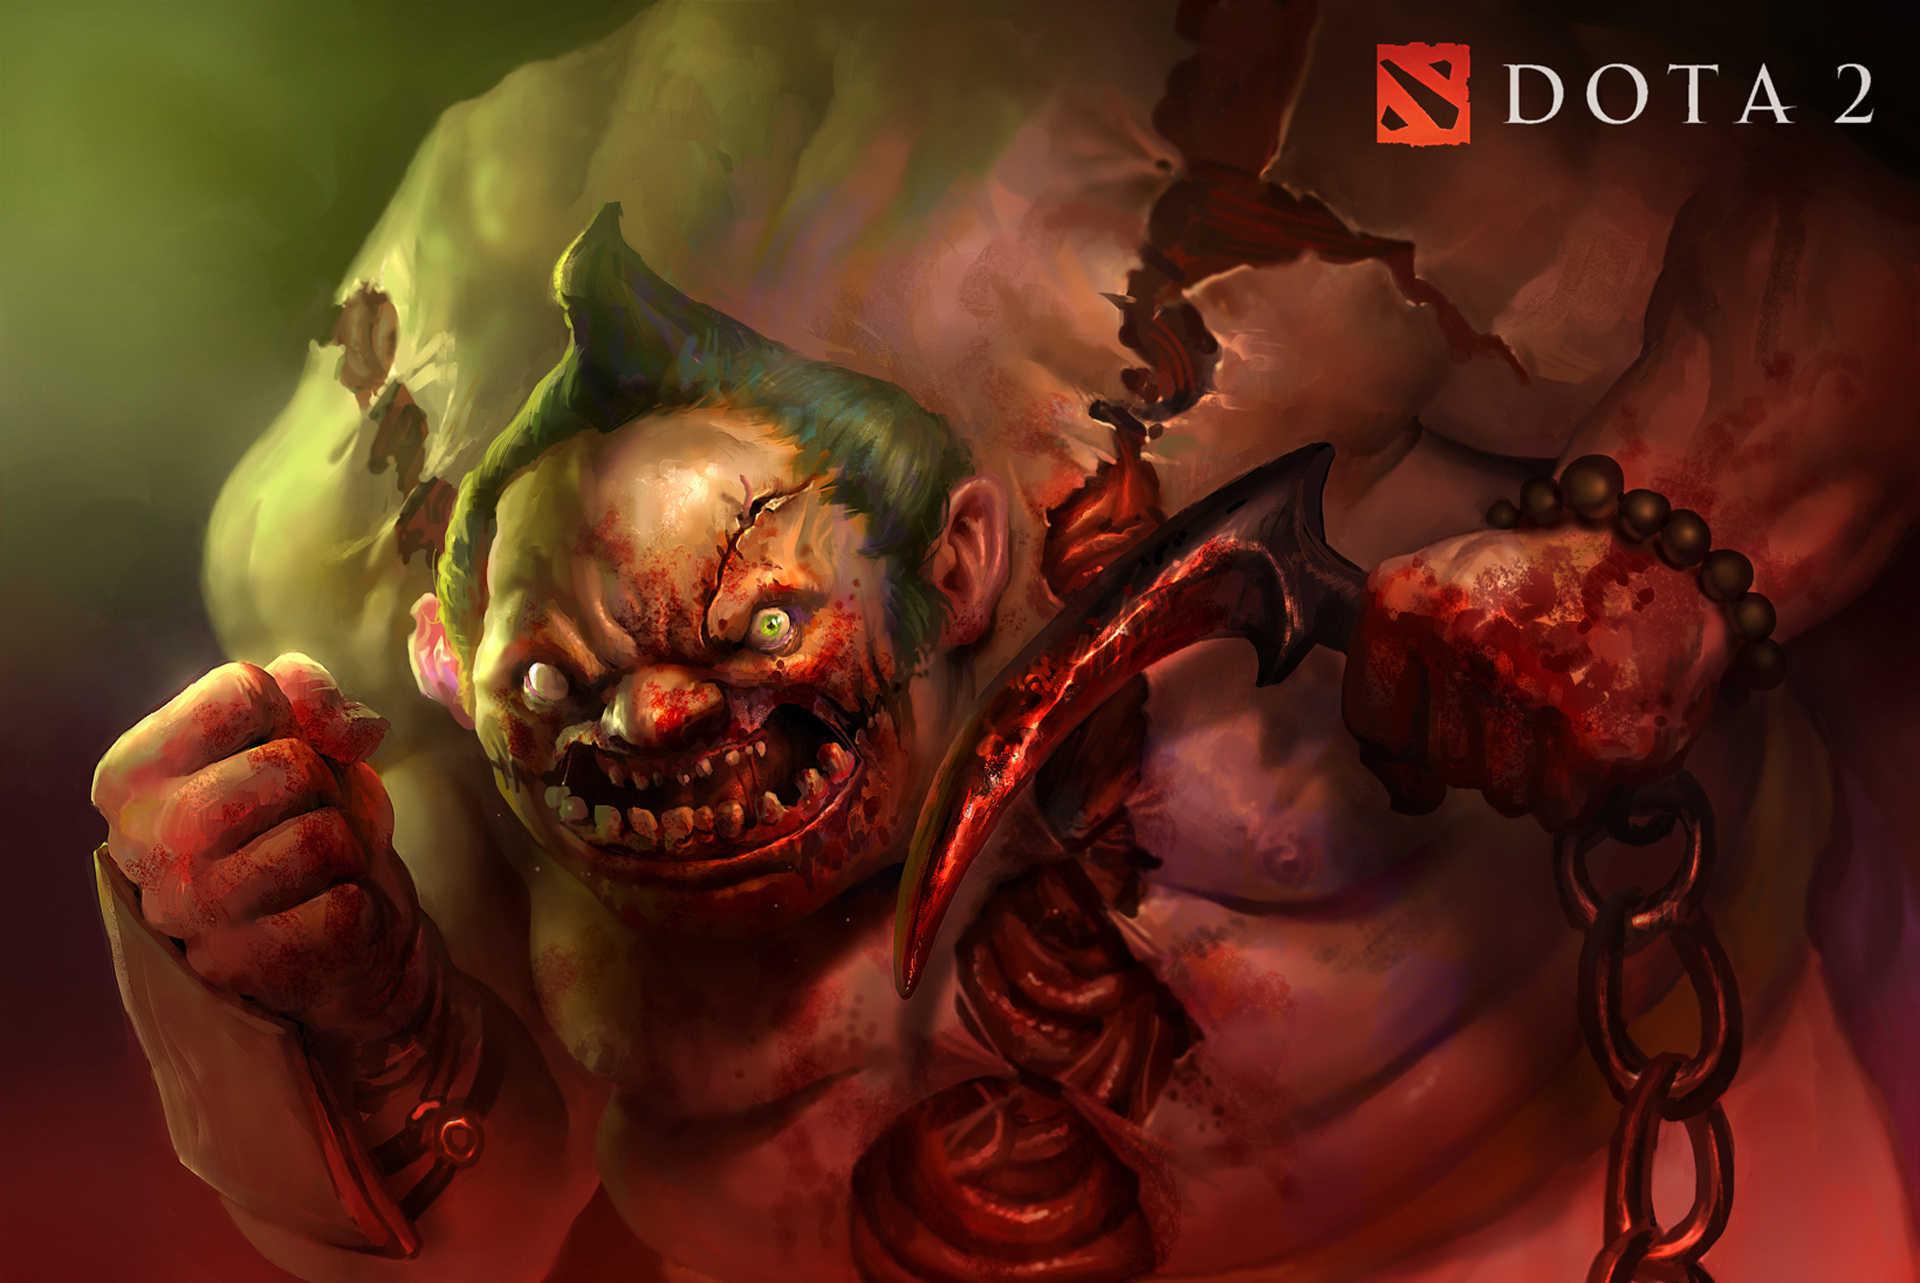 Dota2 Terrorblade Hd Wallpaper Dota 2 Wallpaper Dota 2 Wallpaper Hd Dota 2 Desktop